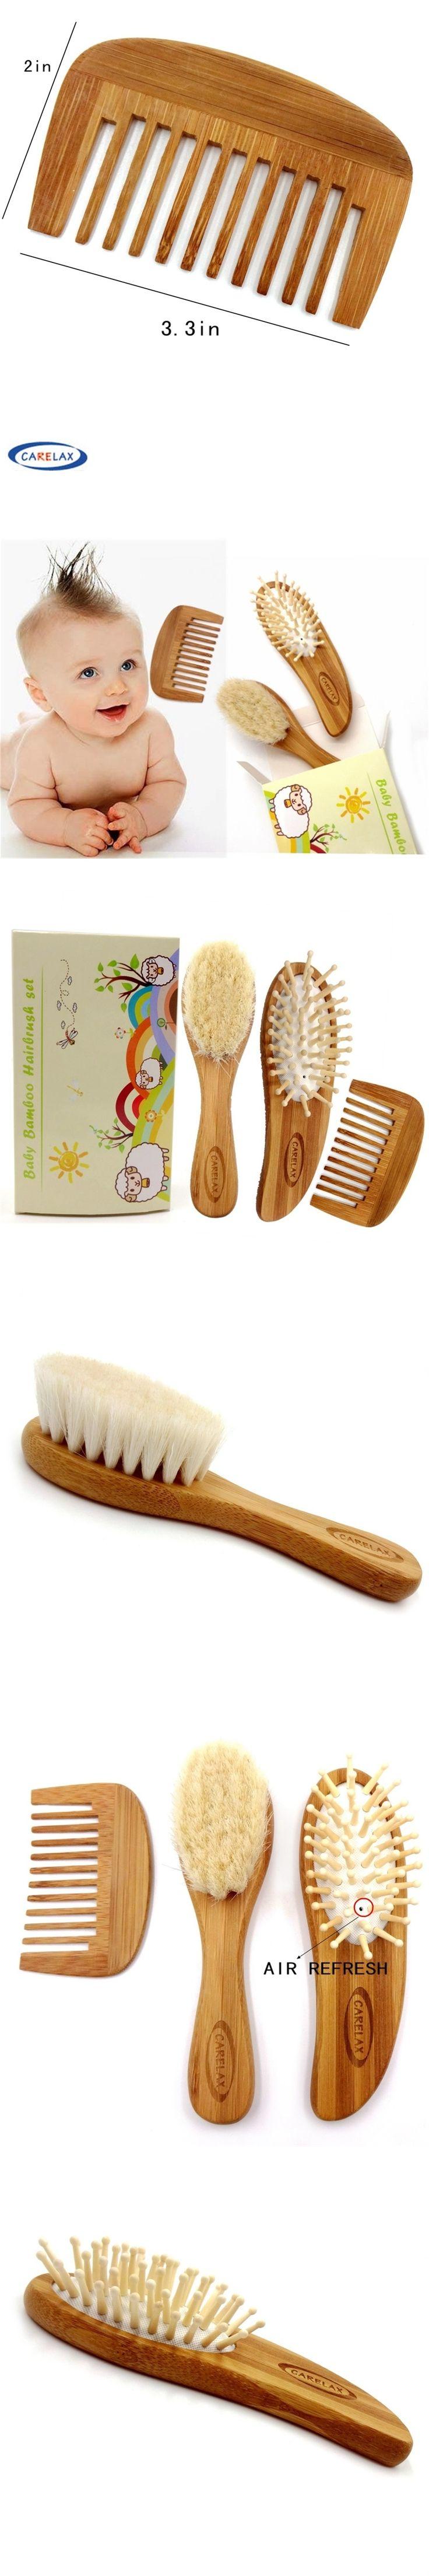 2017 Carelax Wooden Baby Hair Brush and Hair Brush Set  Natural Goat Hair Soft Bristles-Eco Bamboo Comb- Perfect Baby Brush Set